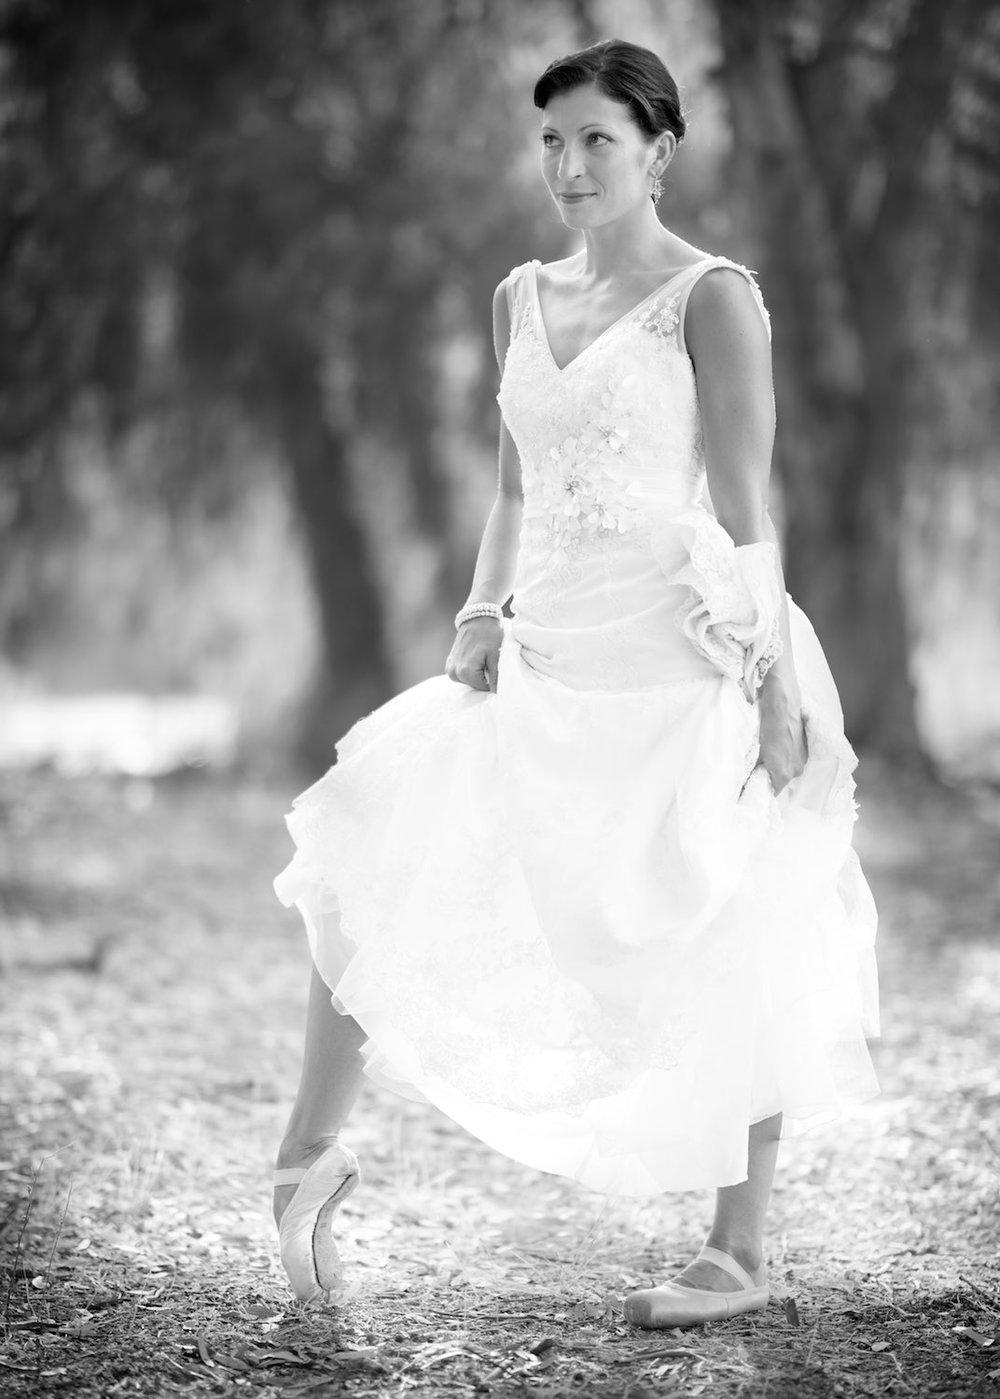 anta-ana-wedding-michal-pfeil-35.jpg